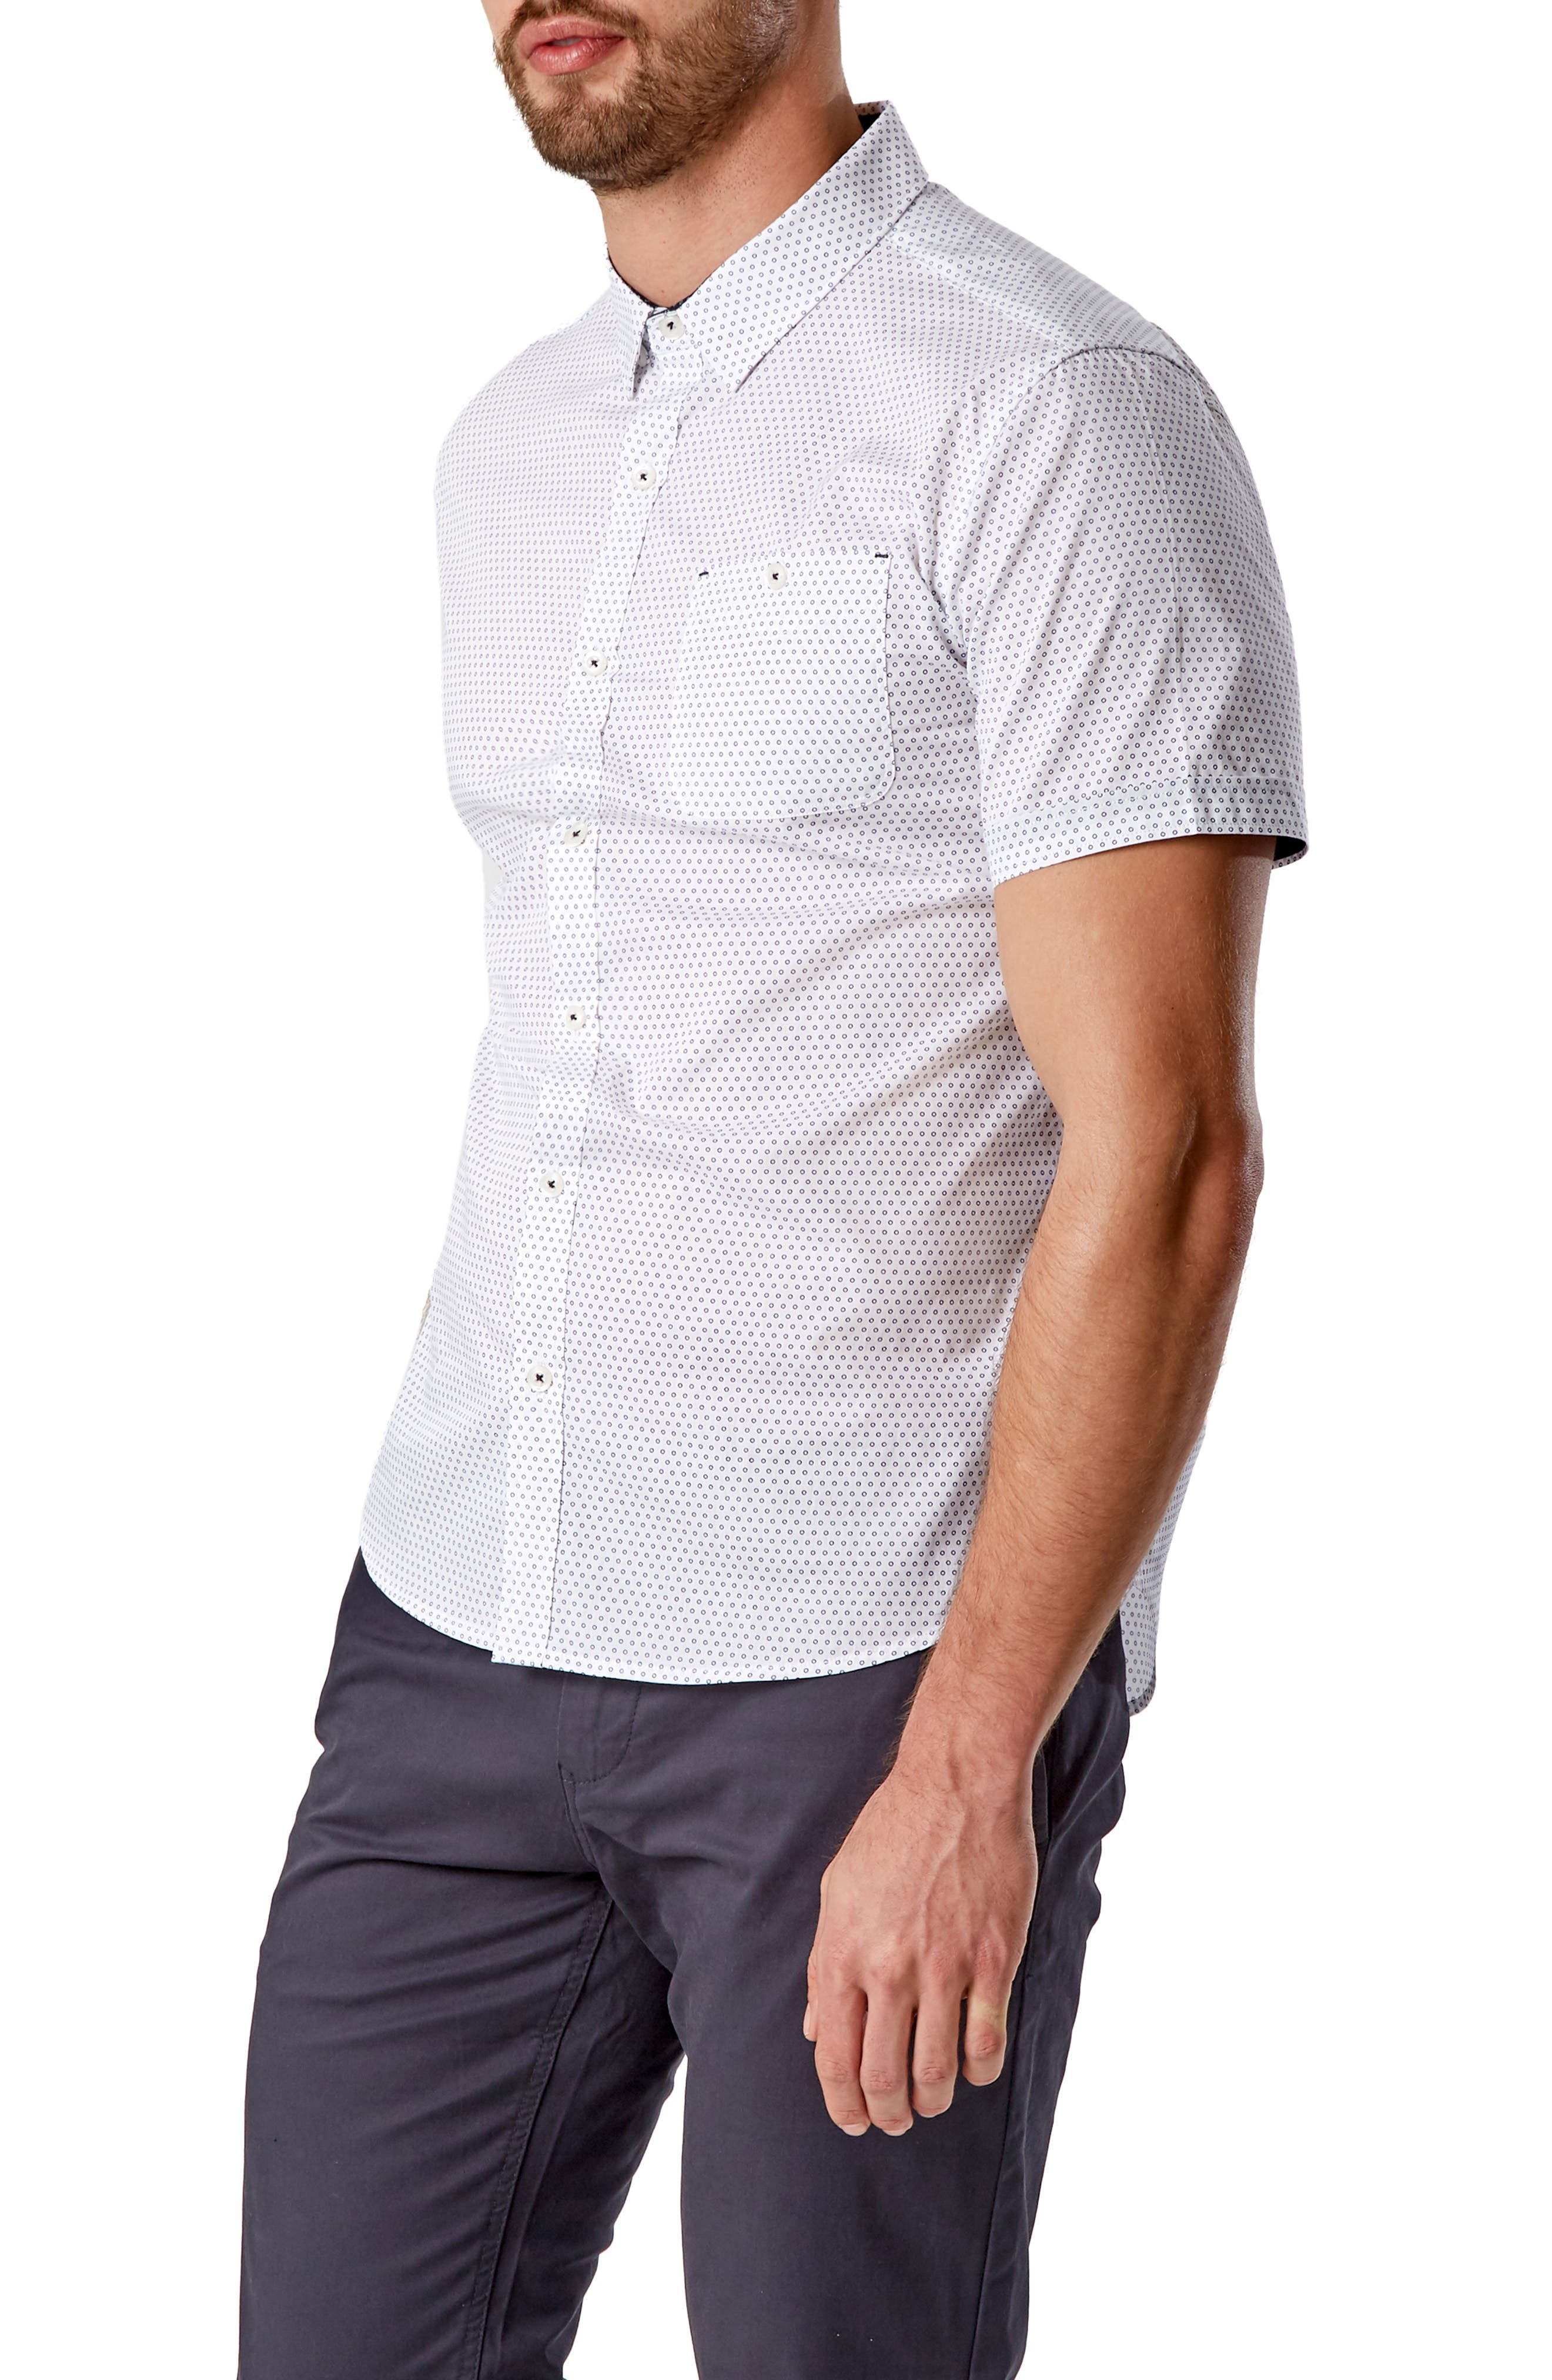 Suavecito Slim Fit Sport Shirt,                             Alternate thumbnail 4, color,                             WHITE